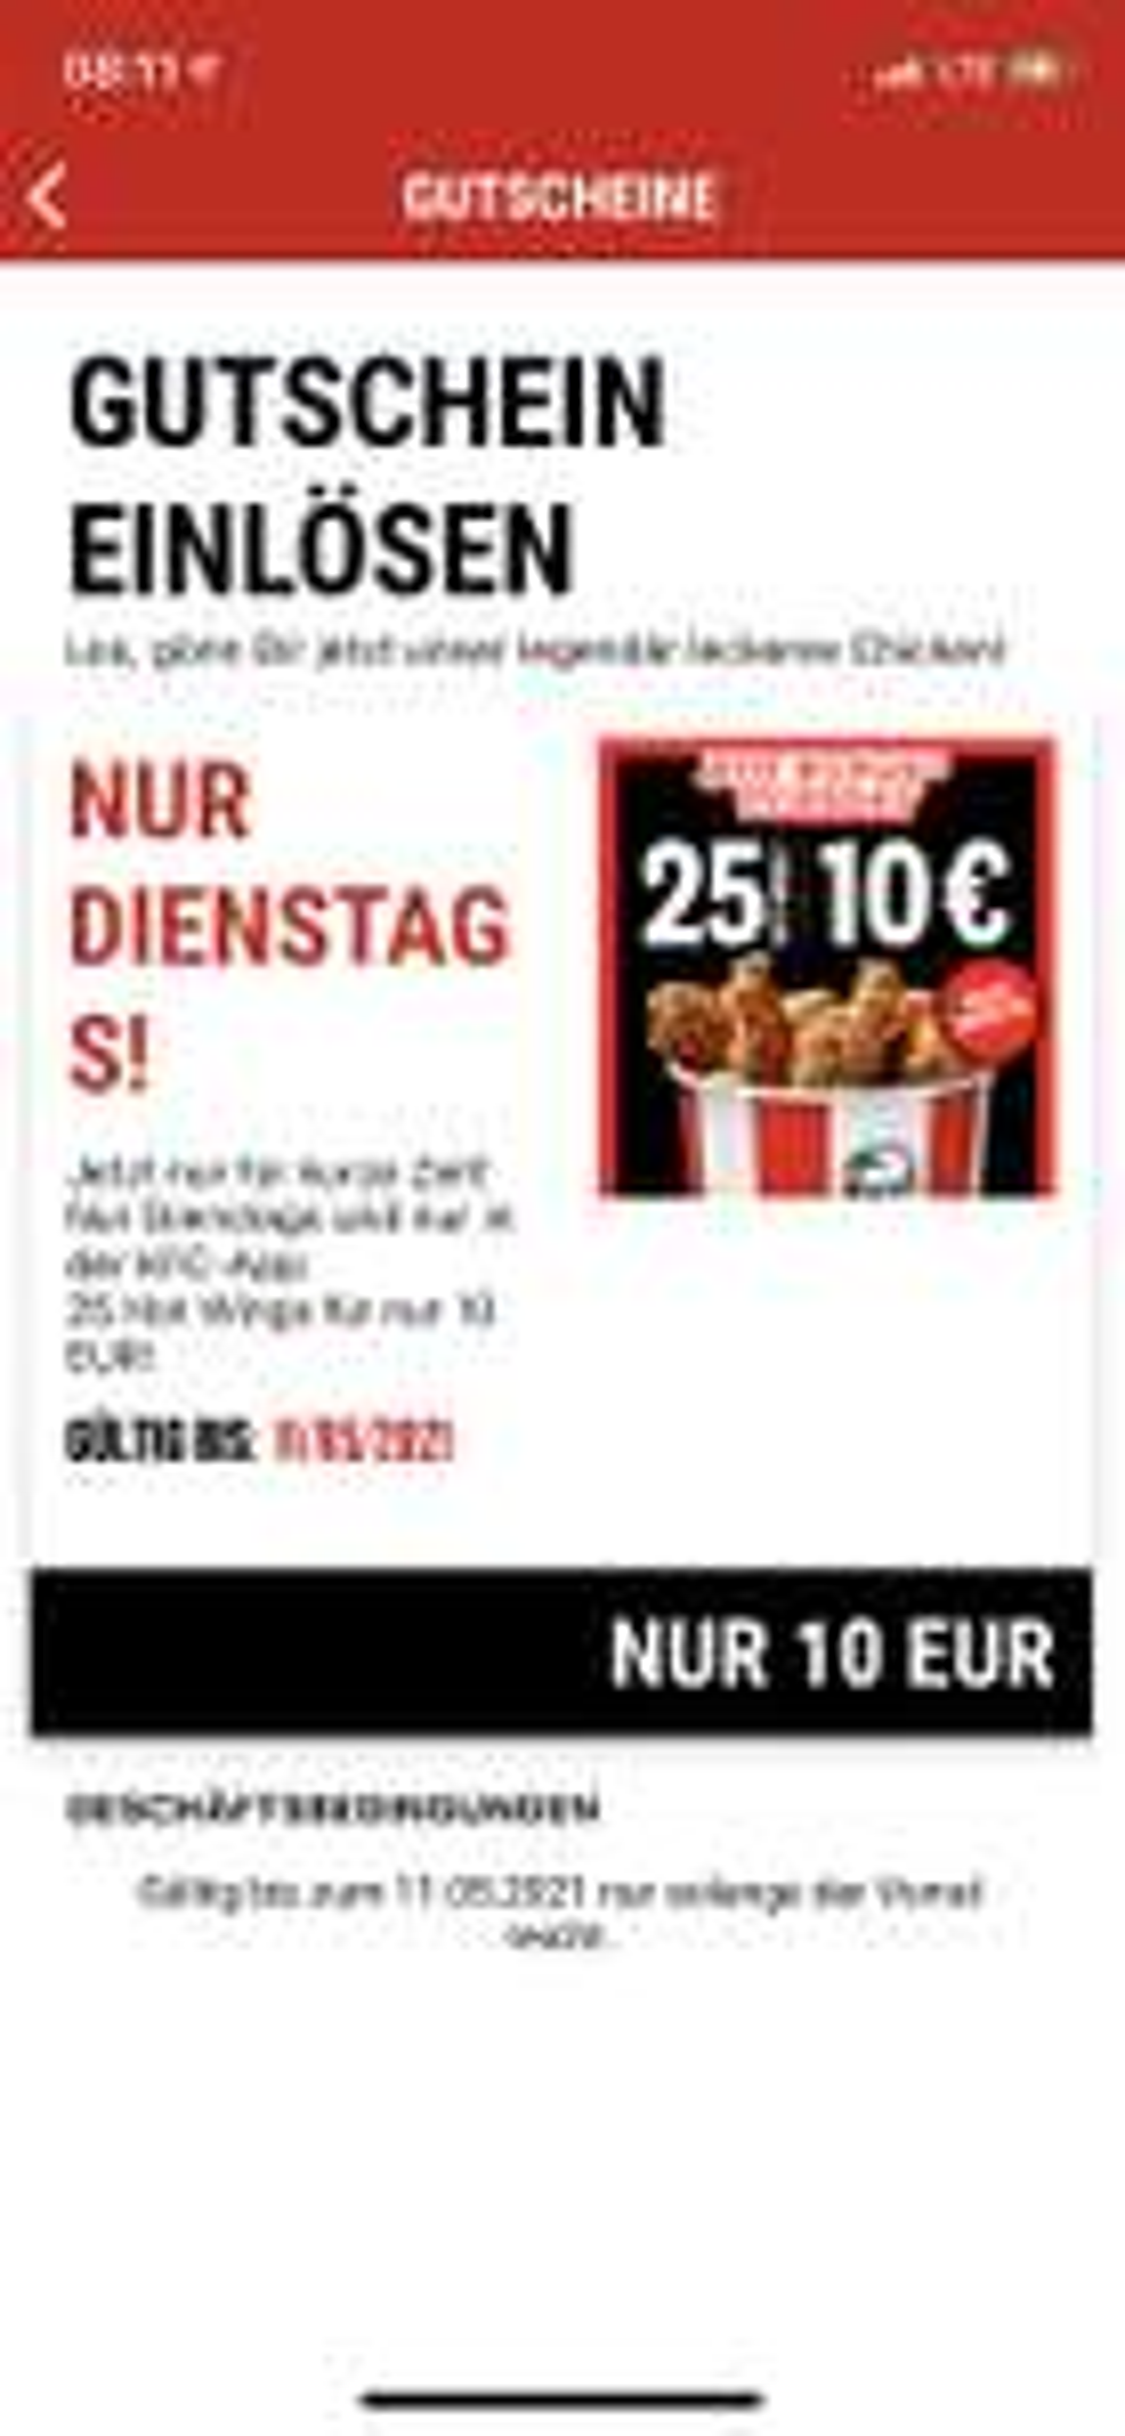 KFC 25 Hot Wings für 10 €